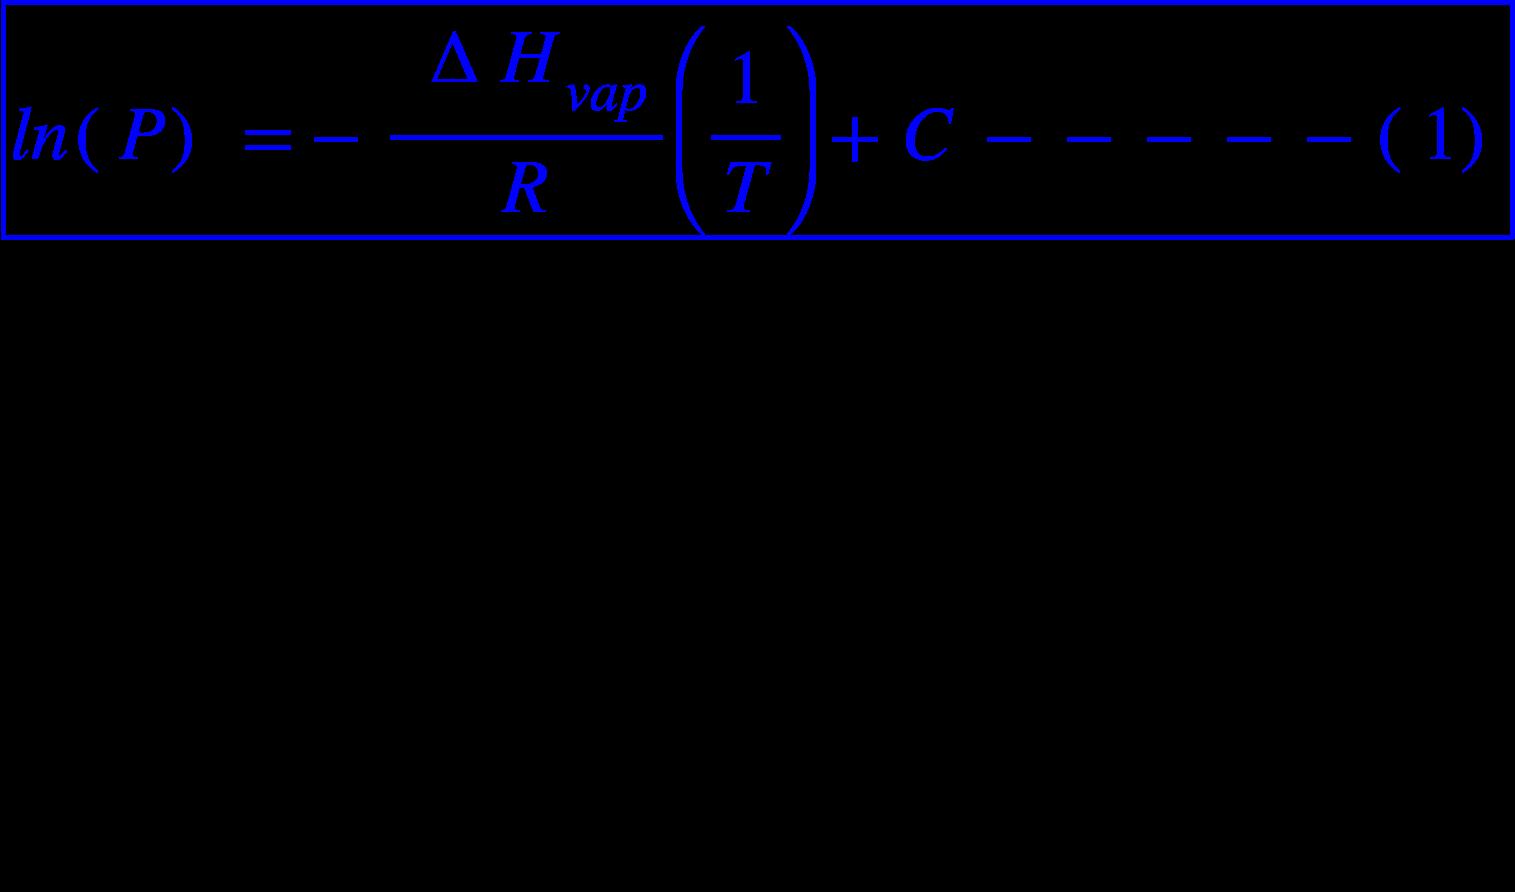 "<math xmlns=""http://www.w3.org/1998/Math/MathML""><menclose mathcolor=""#0000FF"" notation=""box""><mi>l</mi><mi>n</mi><mfenced><mi>P</mi></mfenced><mo>&#xA0;</mo><mo>=</mo><mo>-</mo><mfrac><mrow><mo>&#xA0;</mo><mo>&#x2206;</mo><msub><mi>H</mi><mrow><mi>v</mi><mi>a</mi><mi>p</mi></mrow></msub></mrow><mi>R</mi></mfrac><mfenced><mfrac><mn>1</mn><mi>T</mi></mfrac></mfenced><mo>+</mo><mi>C</mi><mo>&#xA0;</mo><mo>-</mo><mo>-</mo><mo>-</mo><mo>-</mo><mo>-</mo><mfenced><mn>1</mn></mfenced></menclose><mspace linebreak=""newline""></mspace><mi>w</mi><mi>h</mi><mi>e</mi><mi>r</mi><mi>e</mi><mo>,</mo><mo>&#xA0;</mo><mi>P</mi><mo>&#xA0;</mo><mo>=</mo><mo>&#xA0;</mo><mi>P</mi><mi>r</mi><mi>e</mi><mi>s</mi><mi>s</mi><mi>u</mi><mi>r</mi><mi>e</mi><mspace linebreak=""newline""></mspace><mo>&#x2206;</mo><msub><mi>H</mi><mrow><mi>v</mi><mi>a</mi><mi>p</mi></mrow></msub><mo>&#xA0;</mo><mo>=</mo><mo>&#xA0;</mo><mi>e</mi><mi>n</mi><mi>t</mi><mi>h</mi><mi>a</mi><mi>l</mi><mi>p</mi><mi>y</mi><mo>&#xA0;</mo><mi>c</mi><mi>h</mi><mi>a</mi><mi>n</mi><mi>g</mi><mi>e</mi><mo>&#xA0;</mo><mi>o</mi><mi>f</mi><mo>&#xA0;</mo><mi>v</mi><mi>a</mi><mi>p</mi><mi>o</mi><mi>r</mi><mi>i</mi><mi>z</mi><mi>a</mi><mi>t</mi><mi>i</mi><mi>o</mi><mi>n</mi><mspace linebreak=""newline""></mspace><mi>R</mi><mo>&#xA0;</mo><mo>=</mo><mo>&#xA0;</mo><mi>i</mi><mi>d</mi><mi>e</mi><mi>a</mi><mi>l</mi><mo>&#xA0;</mo><mi>g</mi><mi>a</mi><mi>s</mi><mo>&#xA0;</mo><mi>c</mi><mi>o</mi><mi>n</mi><mi>s</mi><mi>t</mi><mi>a</mi><mi>n</mi><mi>t</mi><mspace linebreak=""newline""></mspace><mi>T</mi><mo>&#xA0;</mo><mo>=</mo><mo>&#xA0;</mo><mi>t</mi><mi>e</mi><mi>m</mi><mi>p</mi><mi>e</mi><mi>r</mi><mi>a</mi><mi>t</mi><mi>u</mi><mi>r</mi><mi>e</mi><mspace linebreak=""newline""></mspace><mi>C</mi><mo>&#xA0;</mo><mo>=</mo><mo>&#xA0;</mo><mi>y</mi><mo>-</mo><mi>i</mi><mi>n</mi><mi>t</mi><mi>e</mi><mi>r</mi><mi>c</mi><mi>e</mi><mi>p</mi><mi>t</mi><mo>&#xA0;</mo><mi>o</mi><mi>f</mi><mo>&#xA0;</mo><mi>t</mi><mi>h</mi><mi>e</mi><mo>&#xA0;</mo><mi>s</mi><mi>"